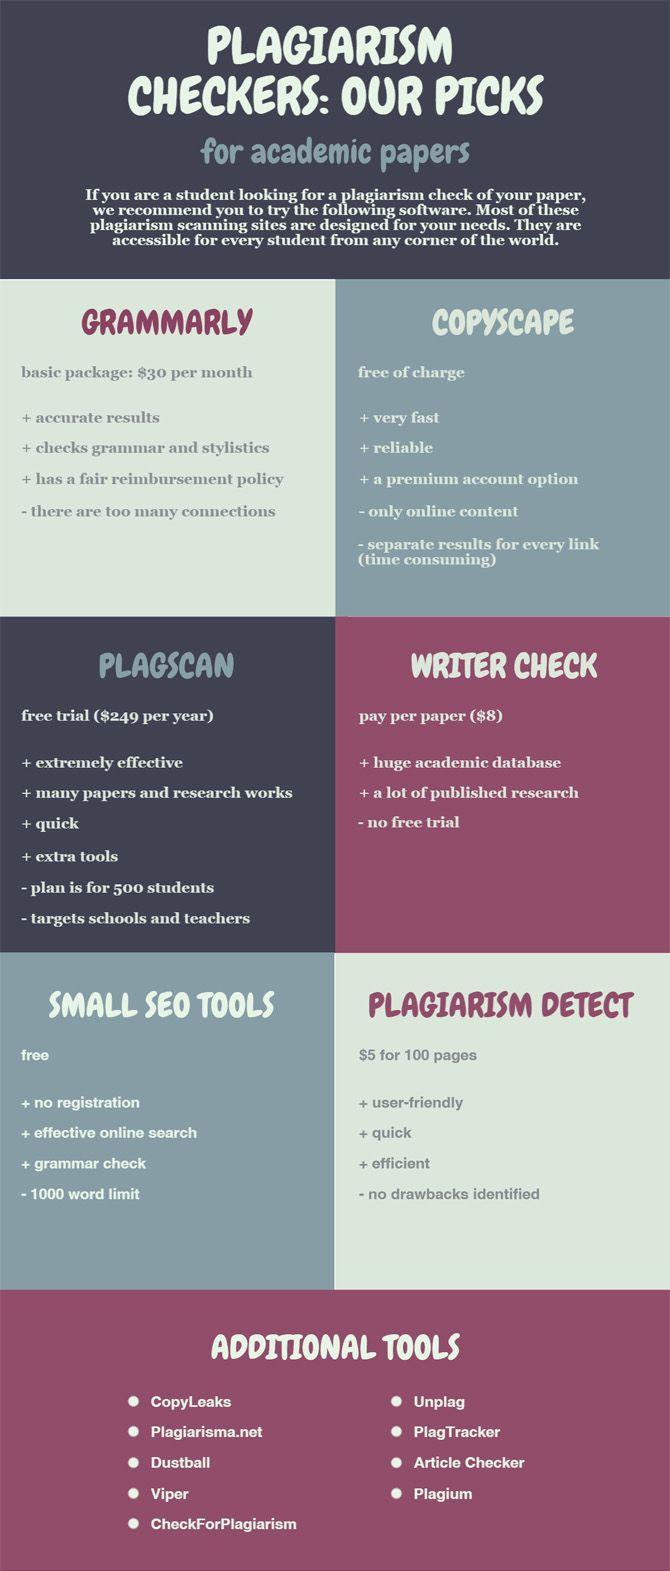 005 Plagiarism checkers Smart.Study Blog Plagiarism